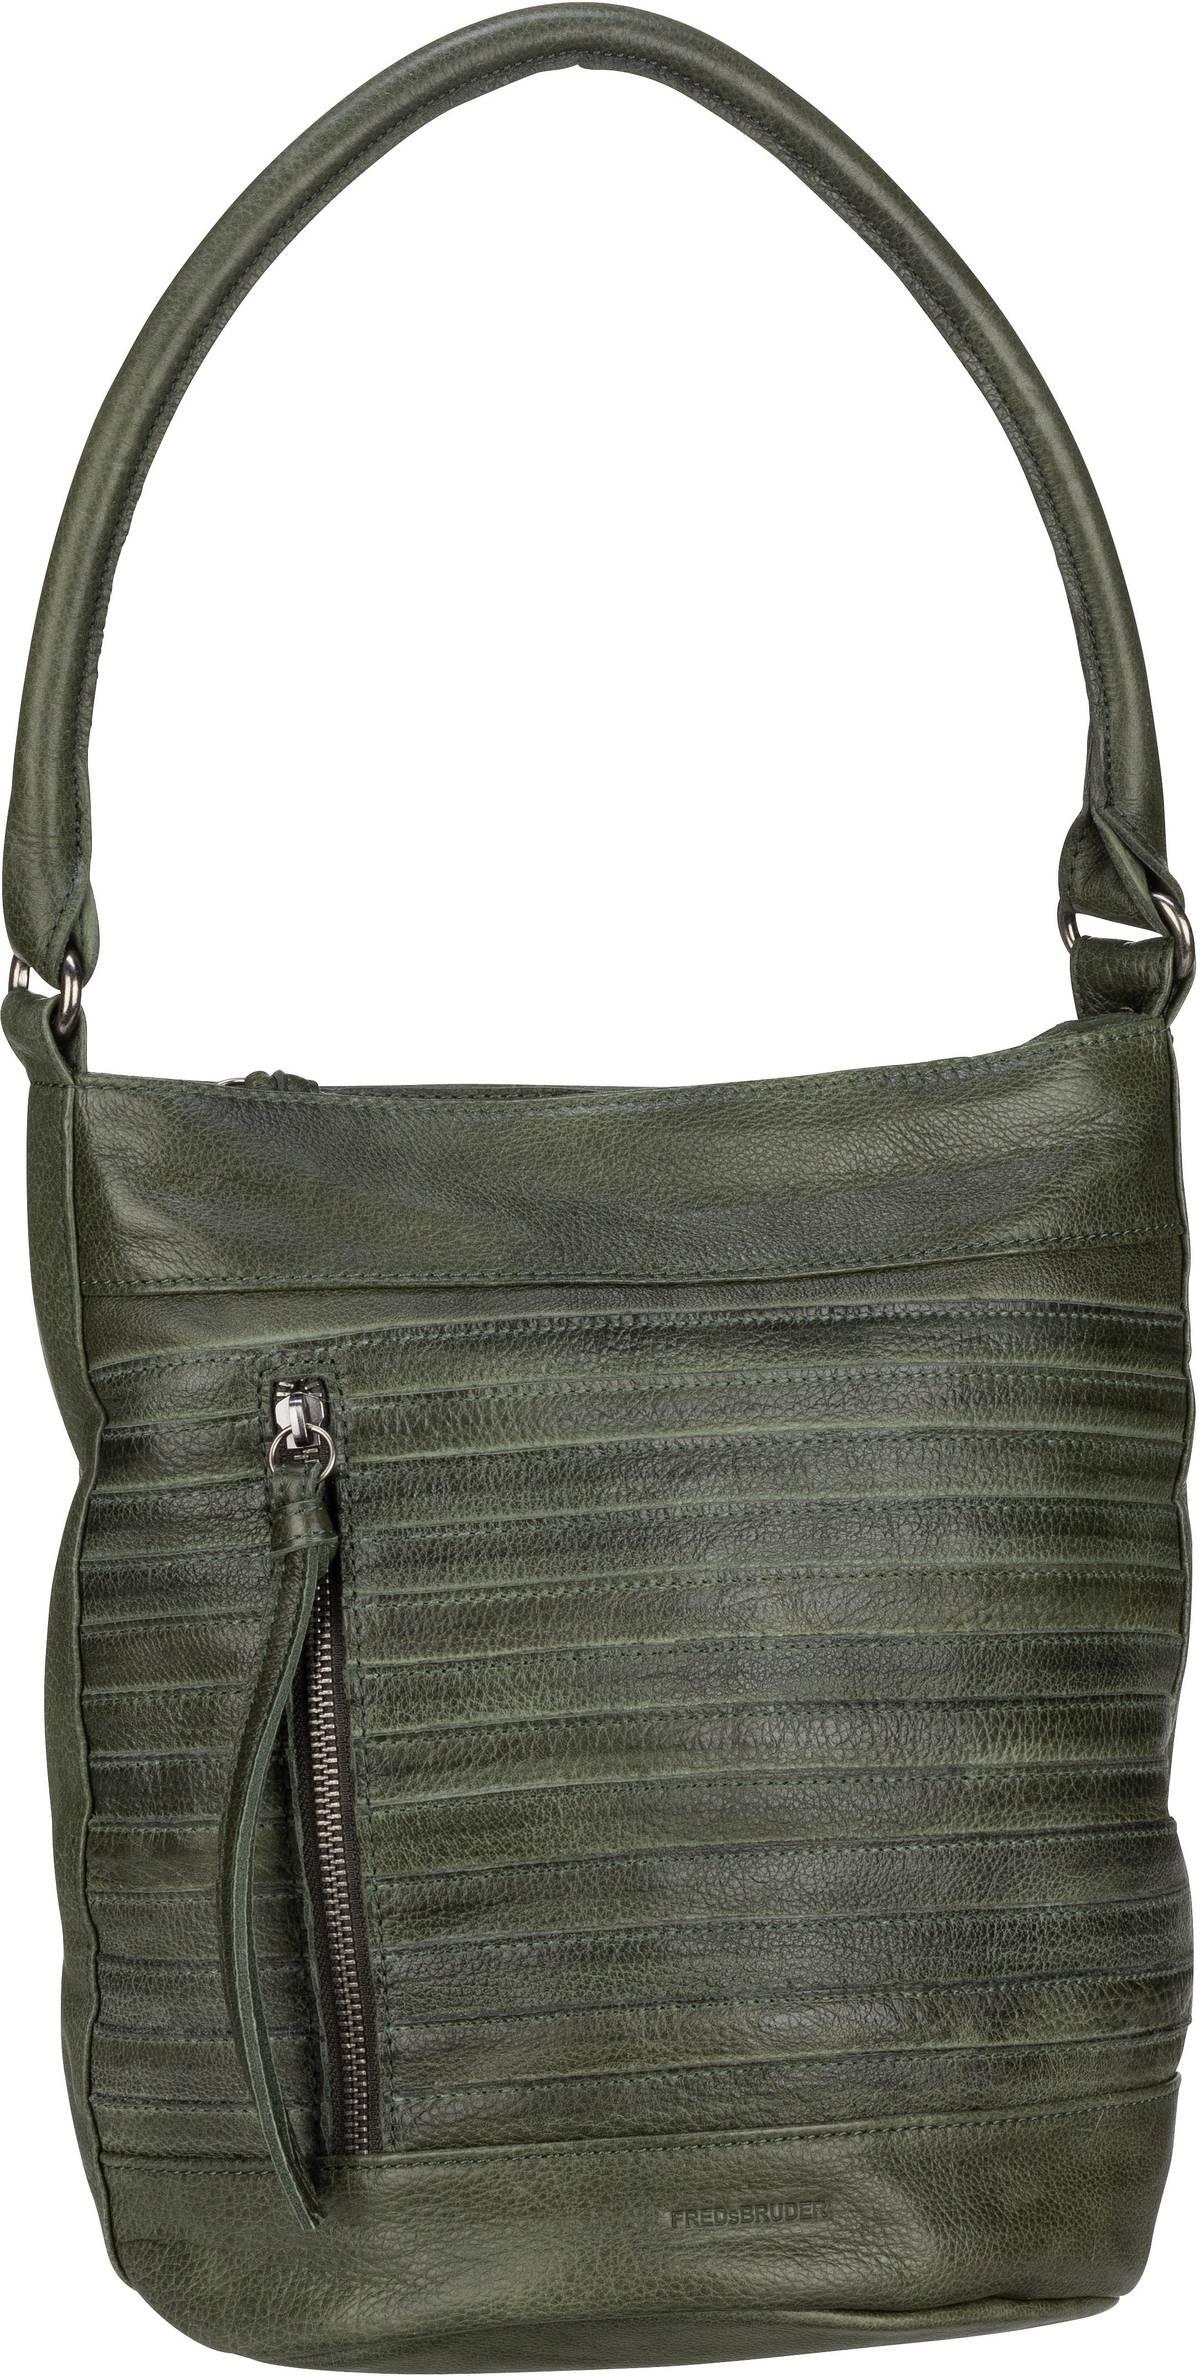 Handtasche Lola Olive